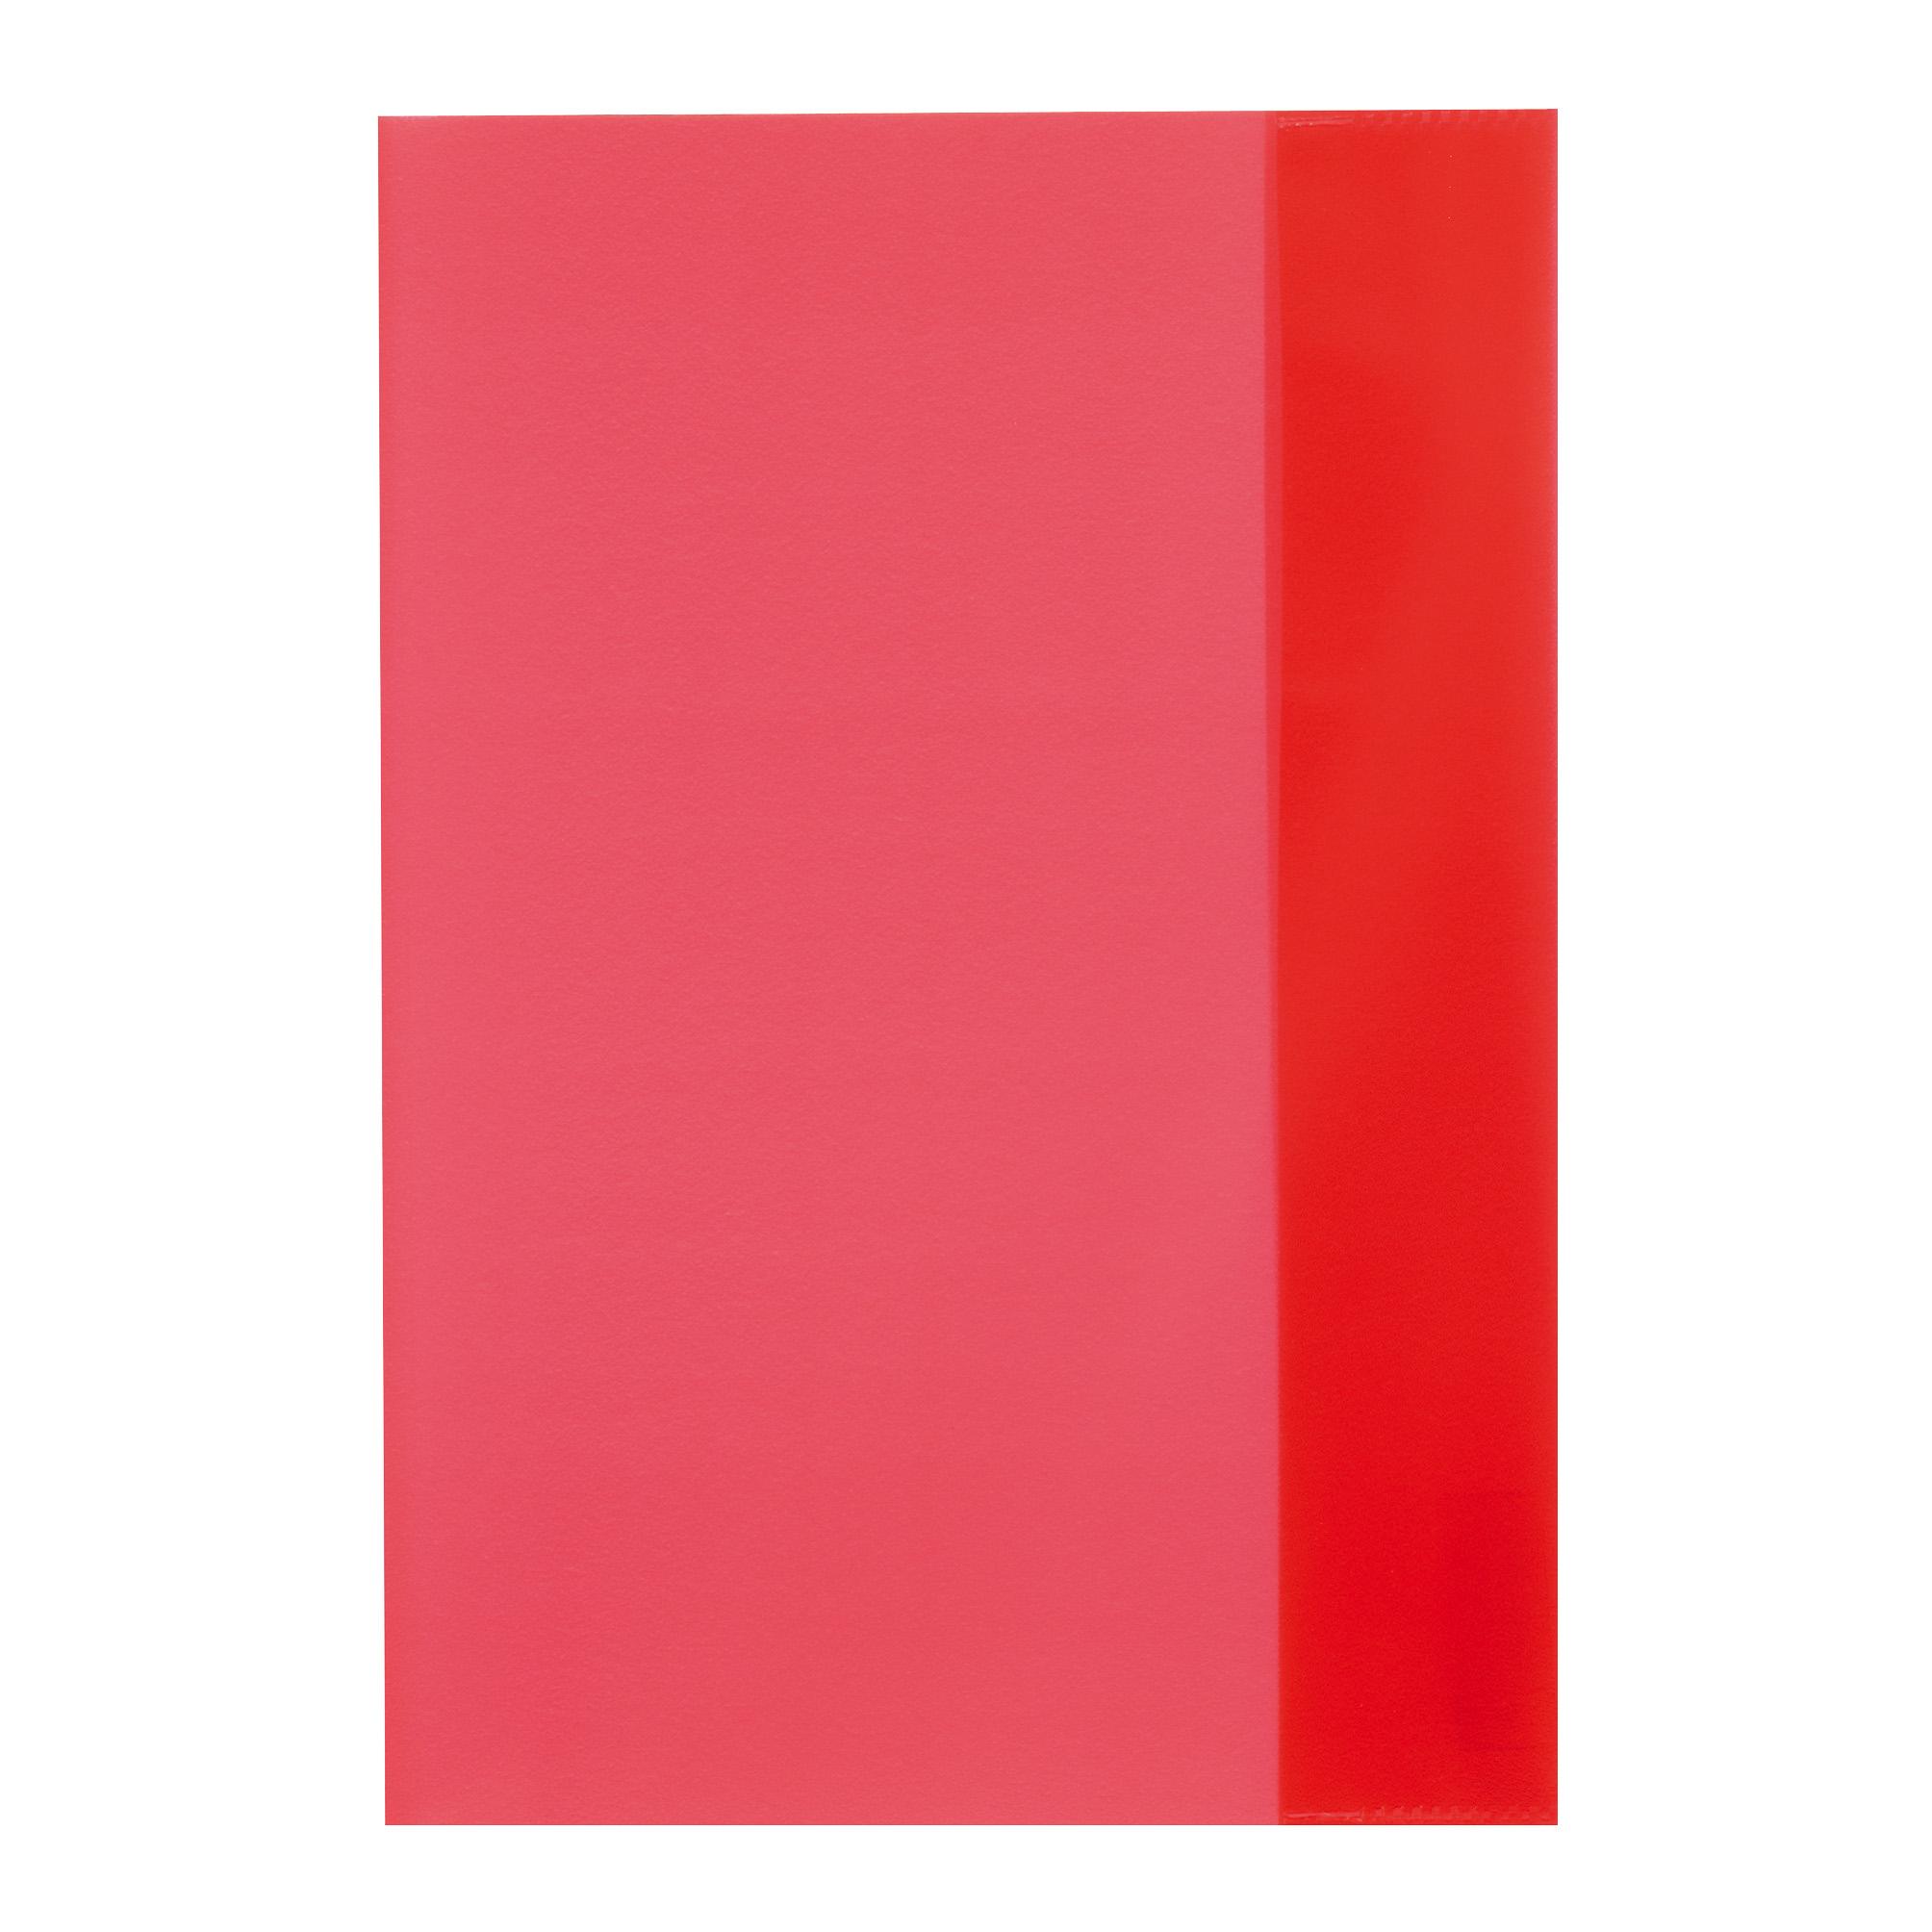 Coperta A5 PP rosu transparent 25 buc/set HERLITZ